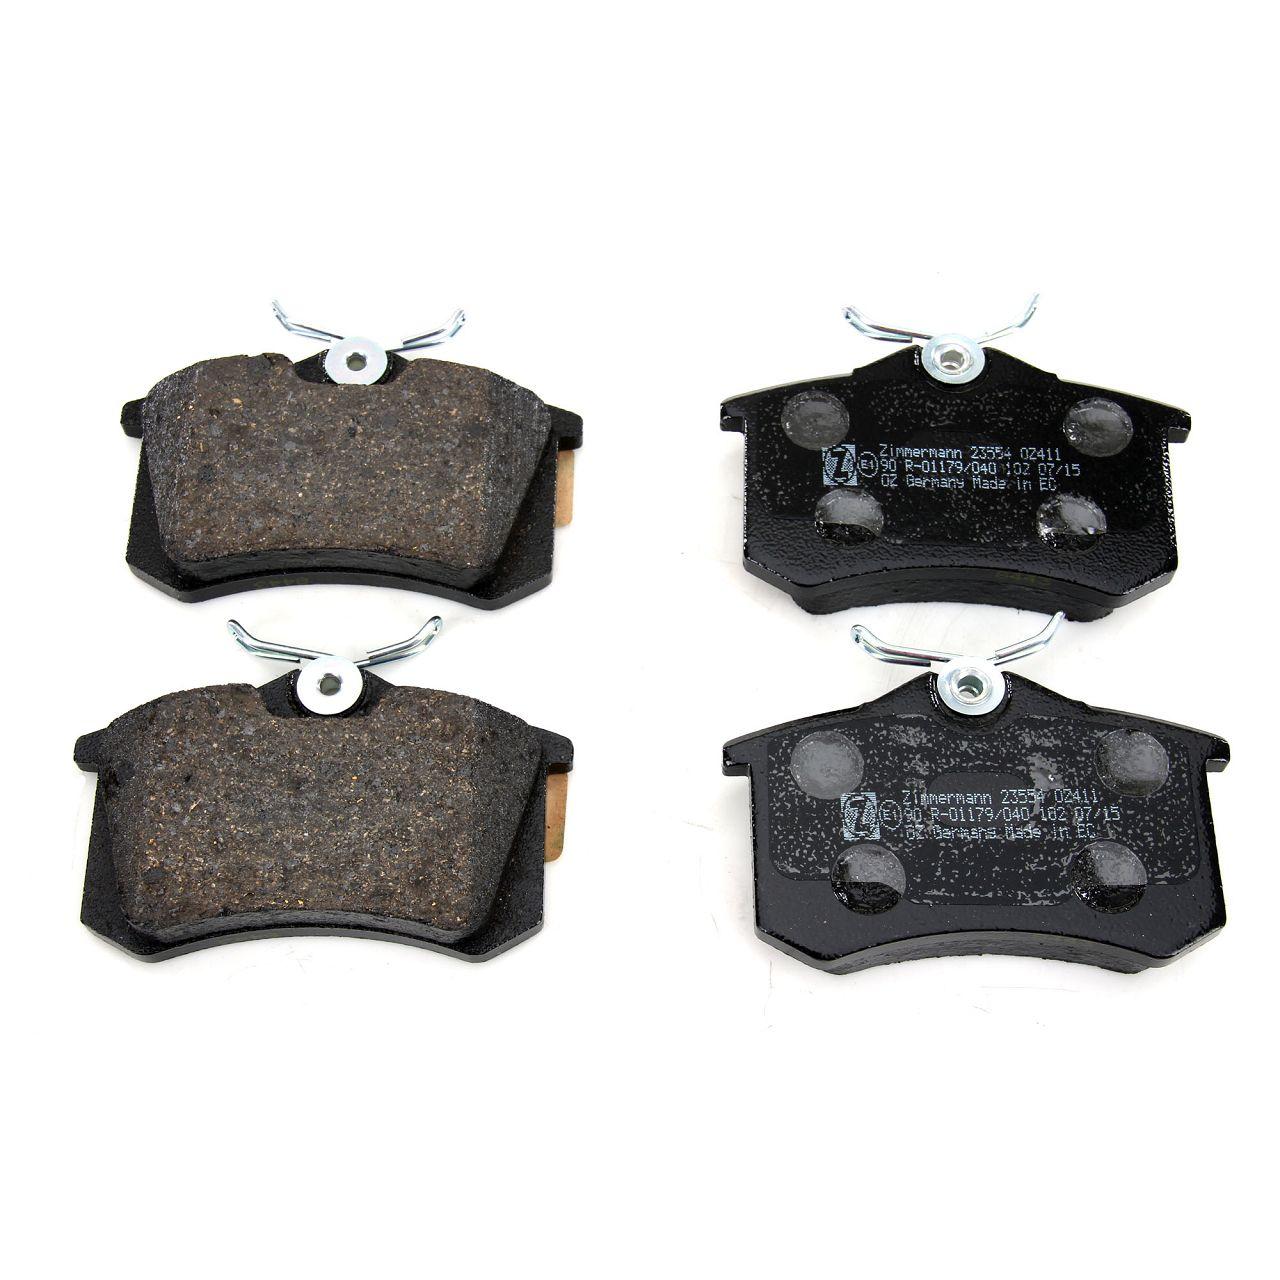 ZIMMERMANN Bremsscheiben + Beläge für AUDI A4 (8E B6 B7) SEAT EXEO (3R) hinten